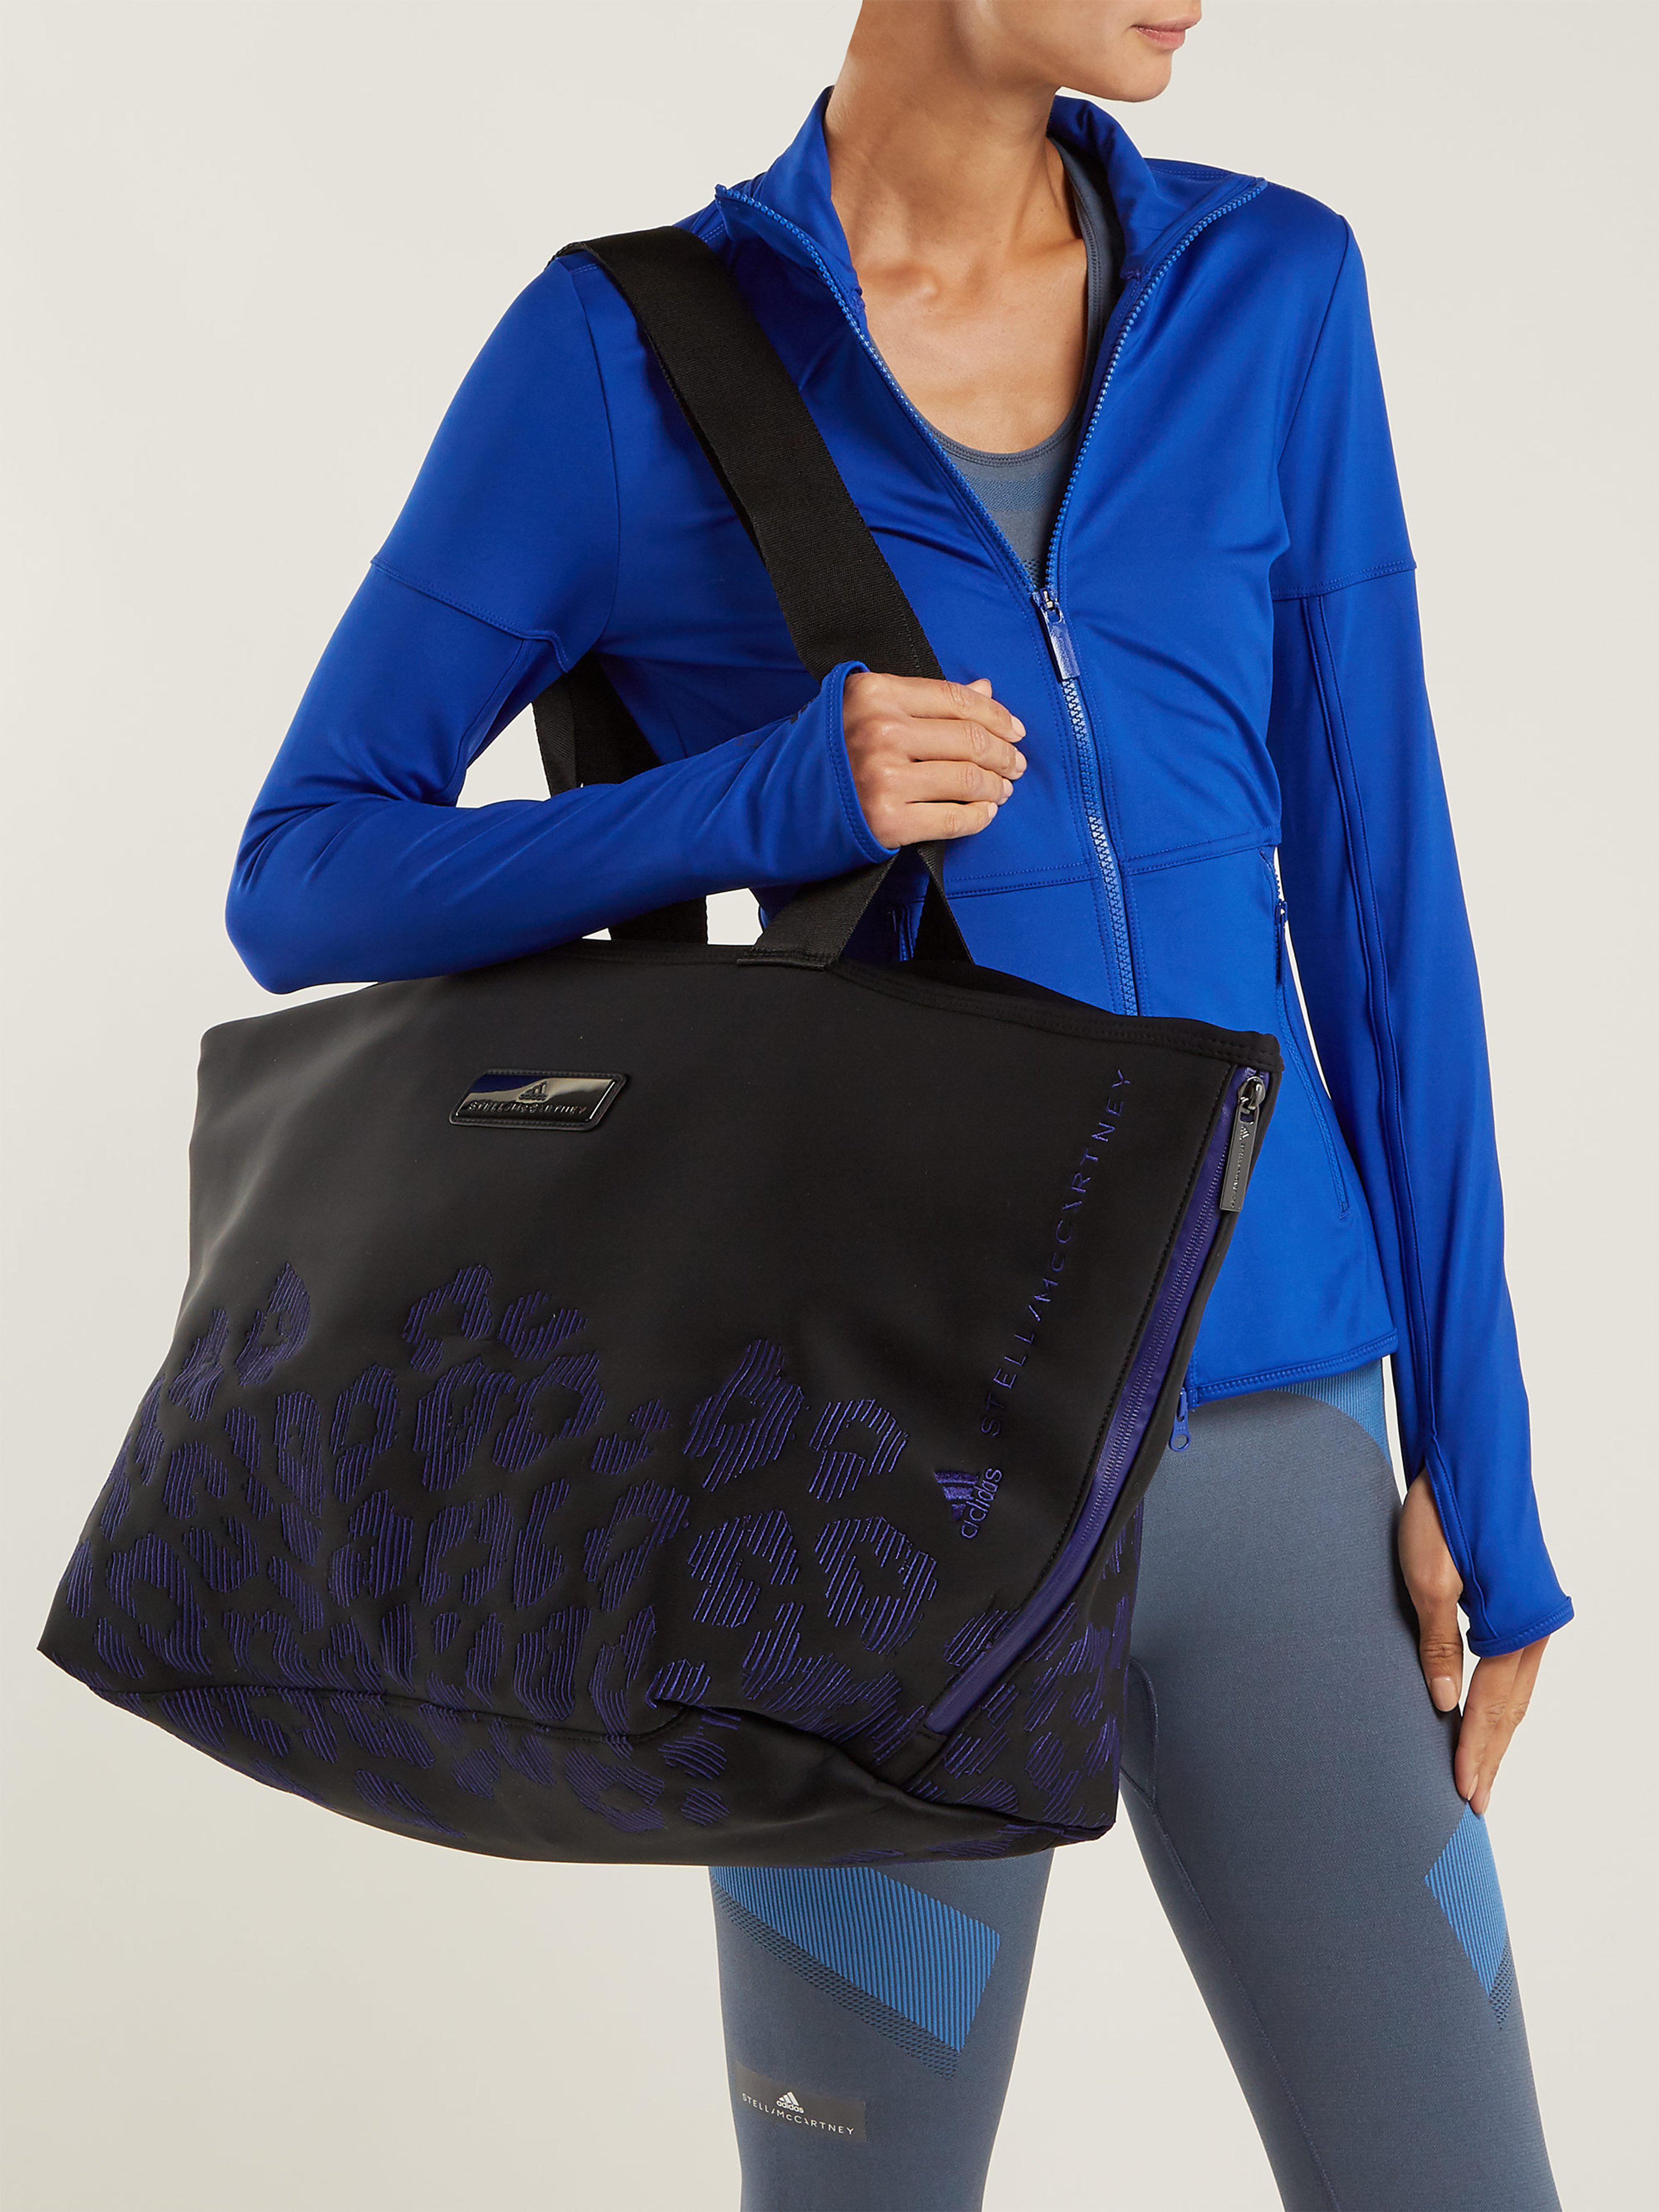 adidas By Stella McCartney Oversized Neoprene Tote in Black Purple (Black)